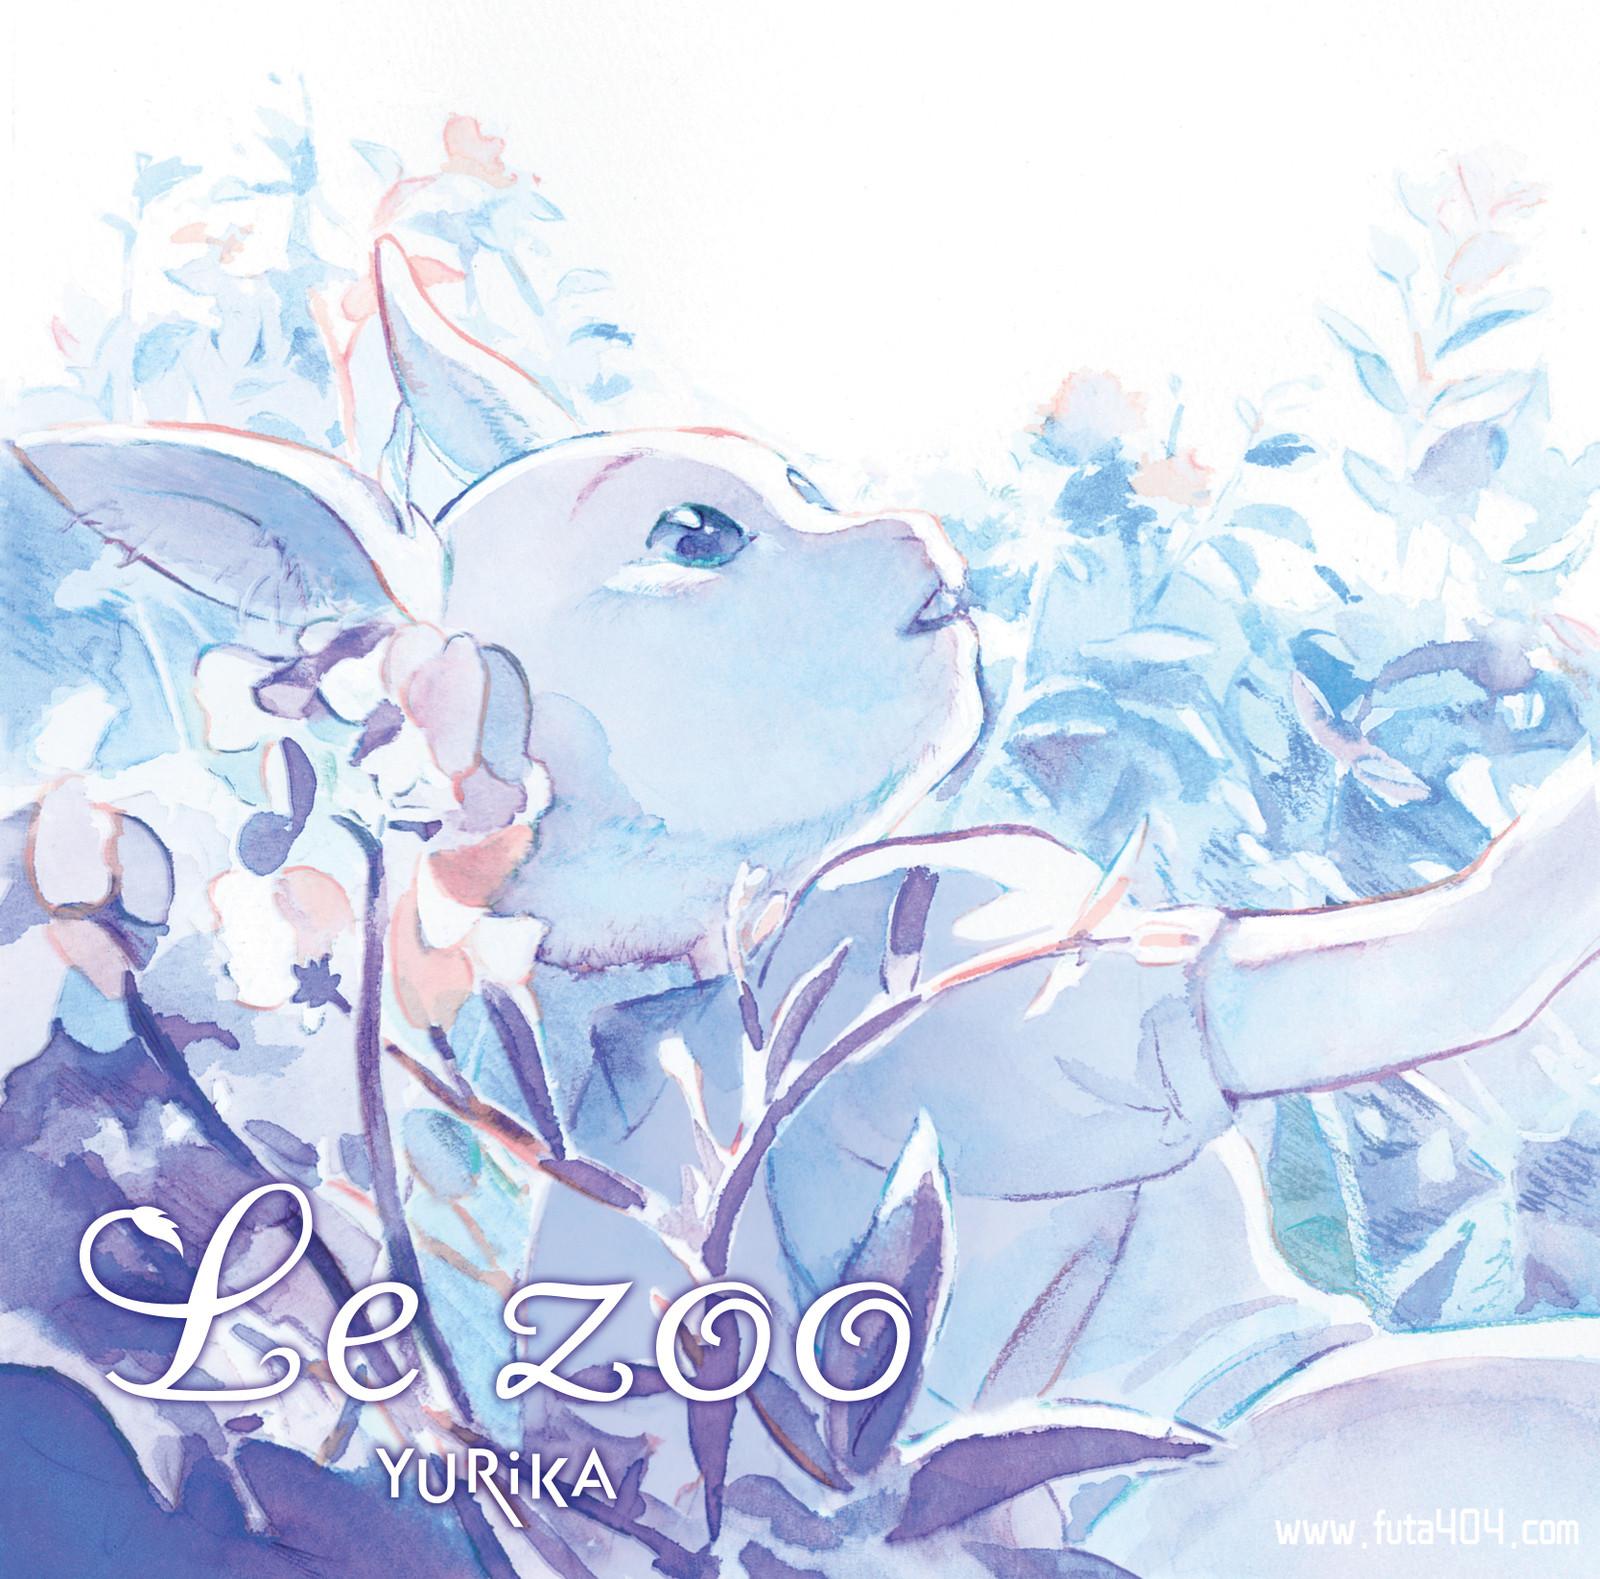 BEASTARS ED片尾曲「Le zoo」下载 BEASTARS 动漫音乐 第1张